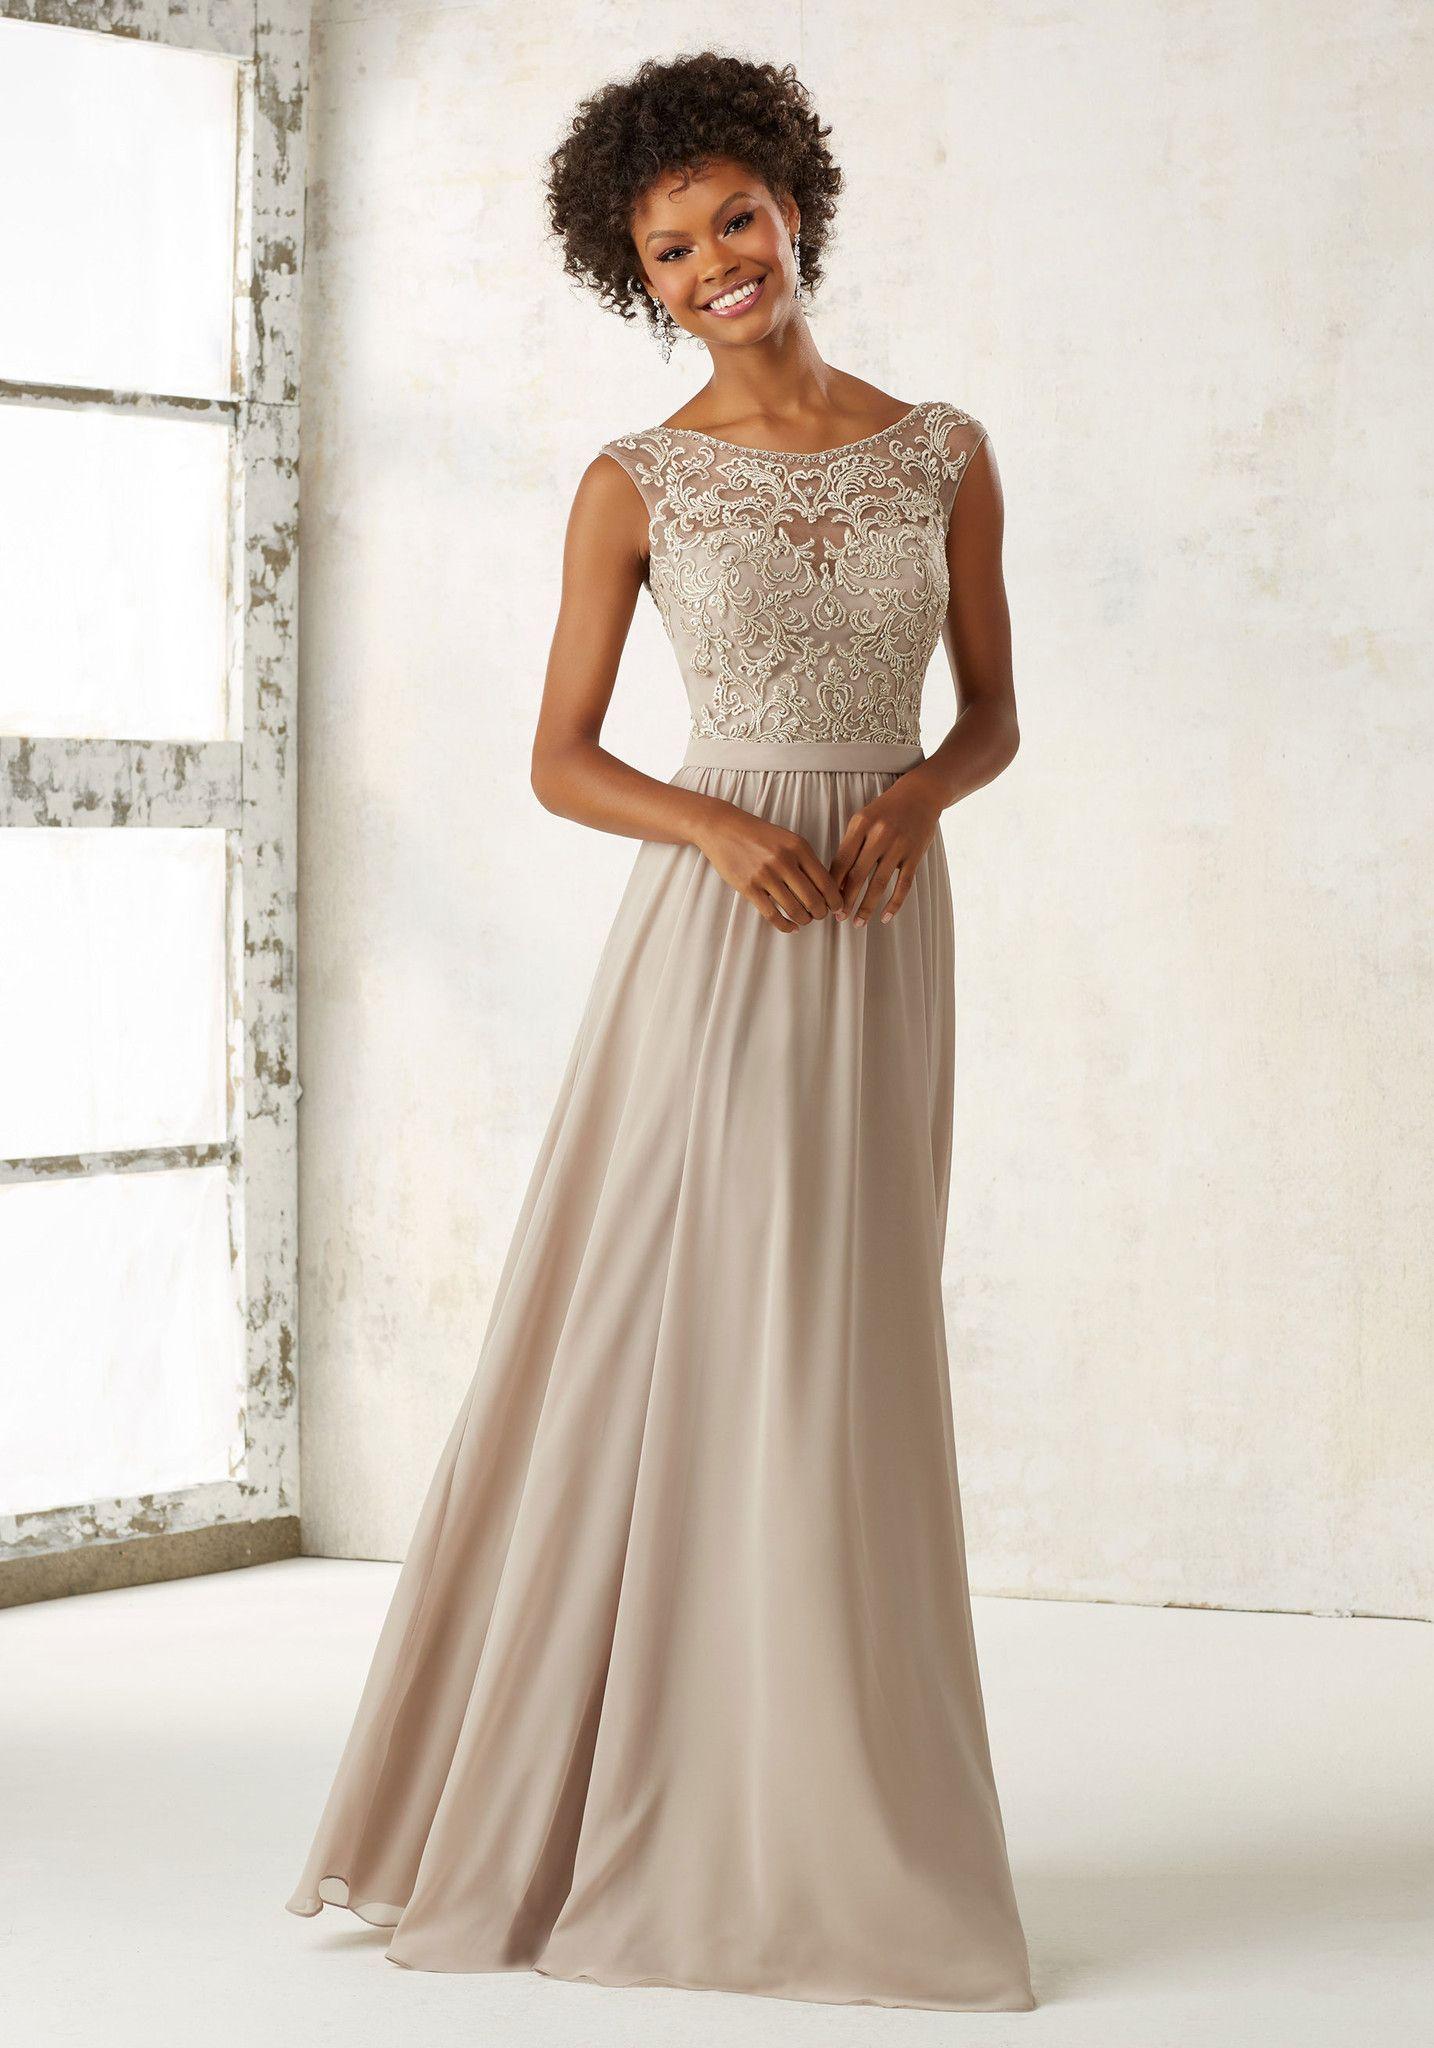 Morilee Bridesmaids Dresses - 21522 - All Dressed Up | Tuxedo rental ...